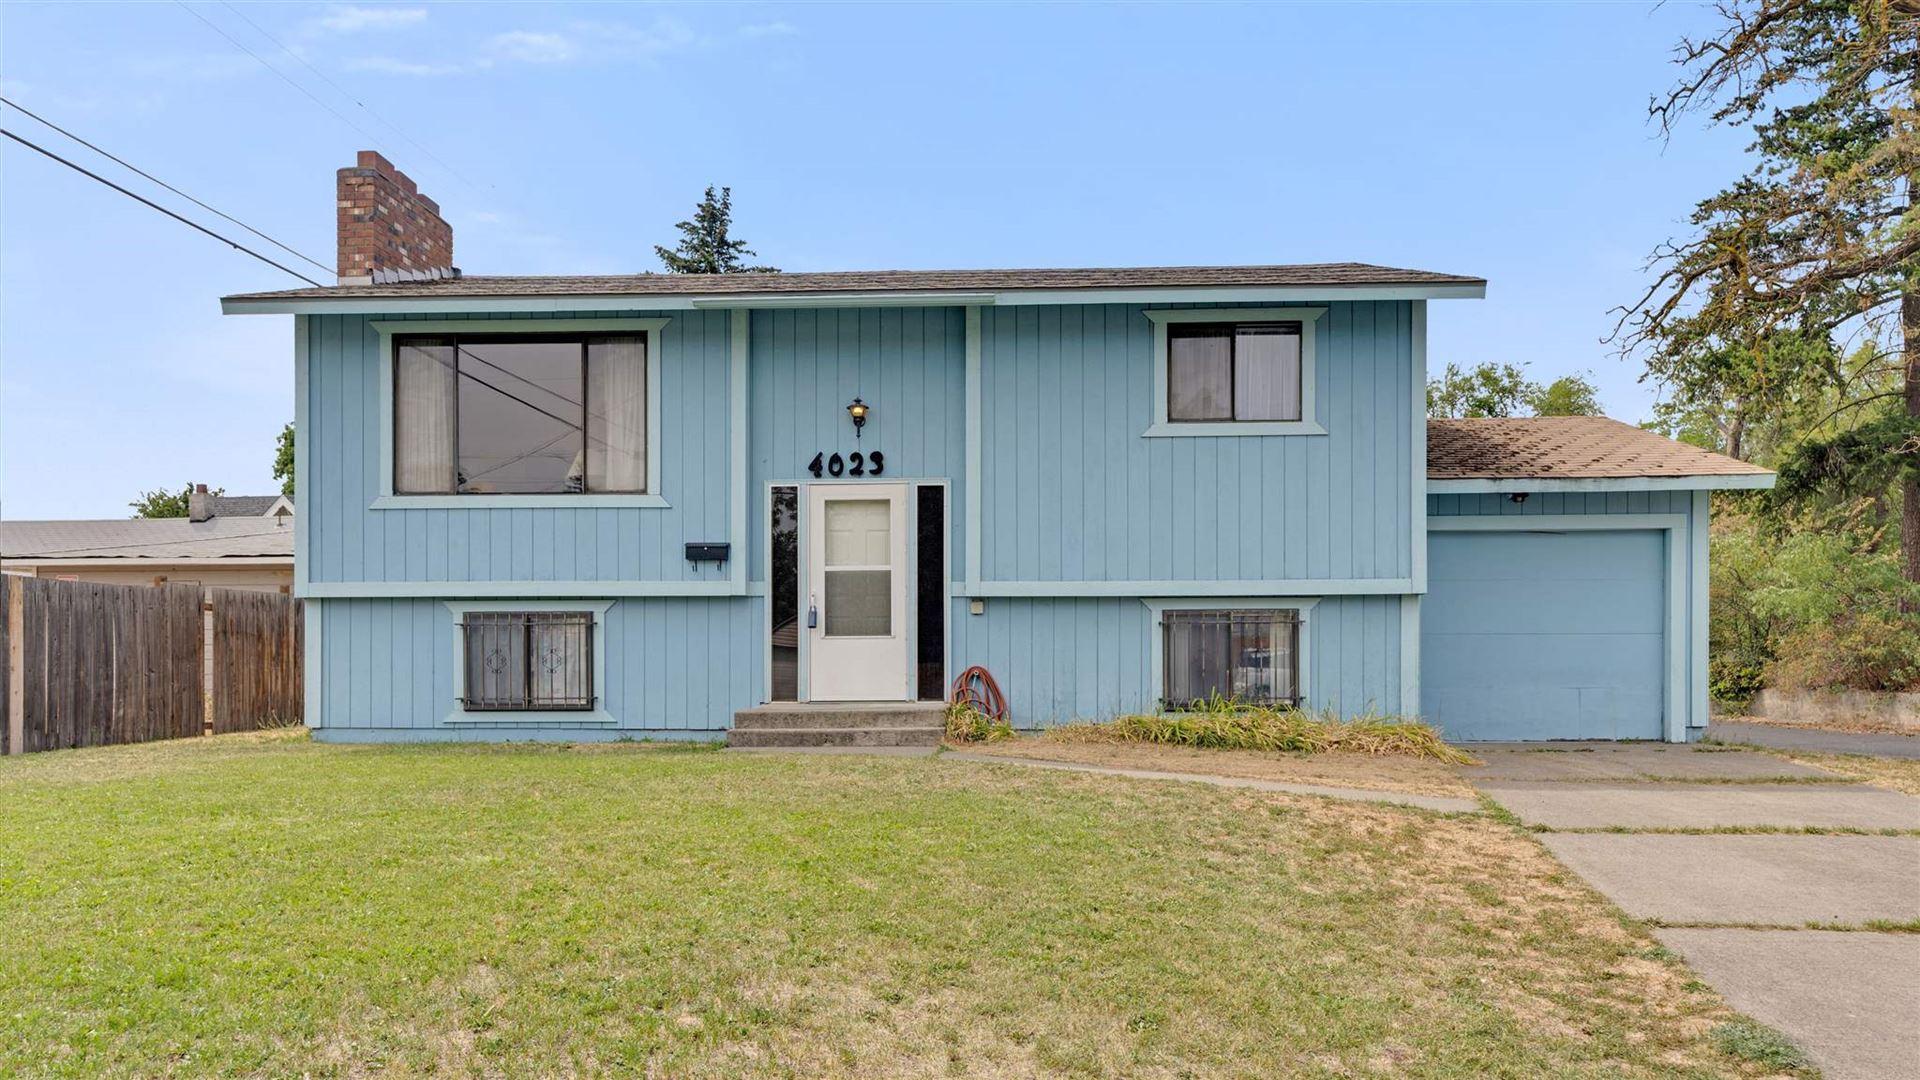 4023 N Helena St, Spokane, WA 99207 - #: 202119540